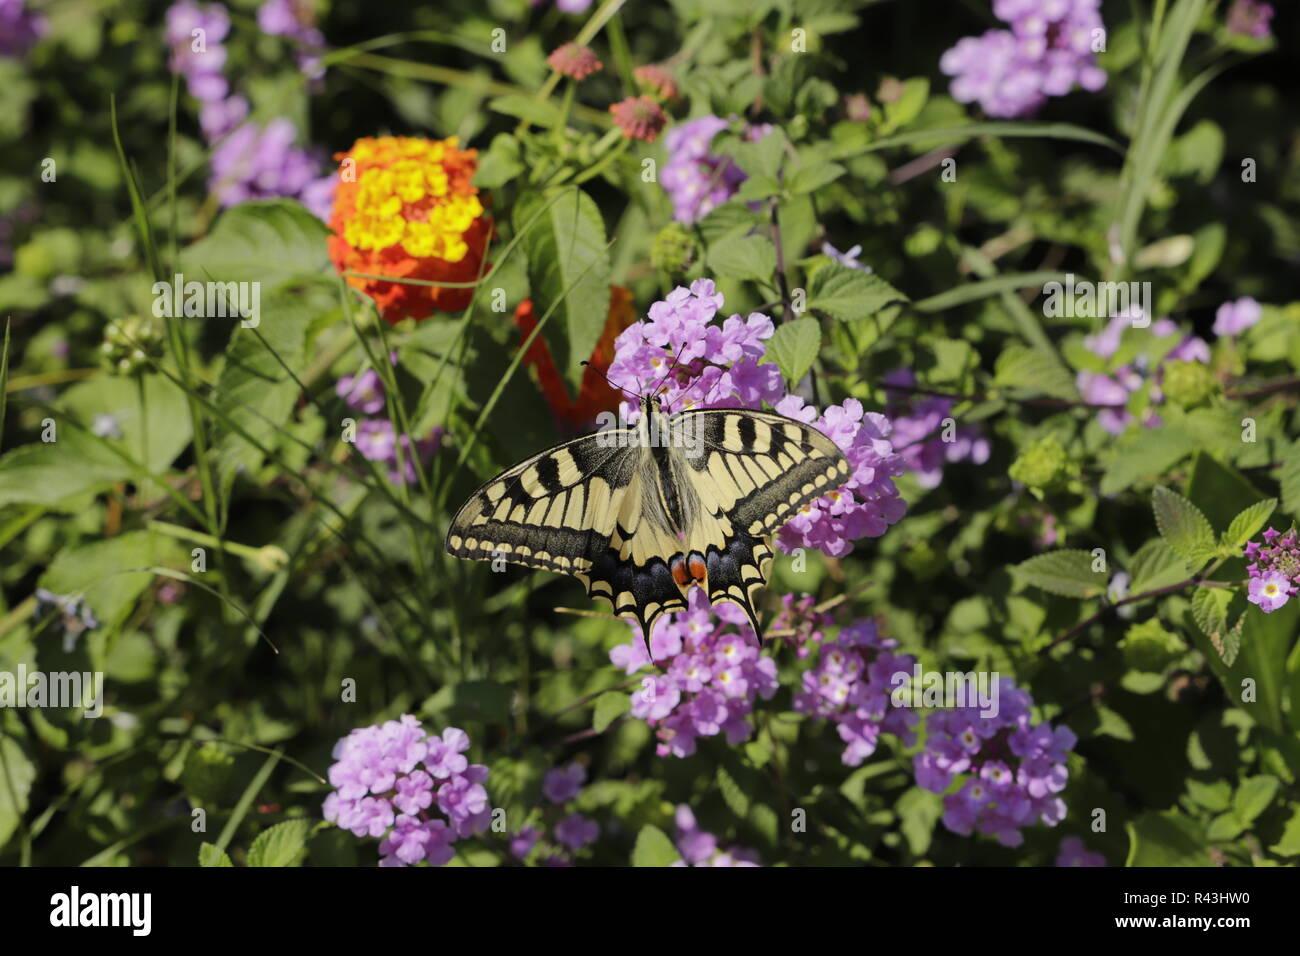 Zipping Stockfotos & Zipping Bilder Seite 2 Alamy